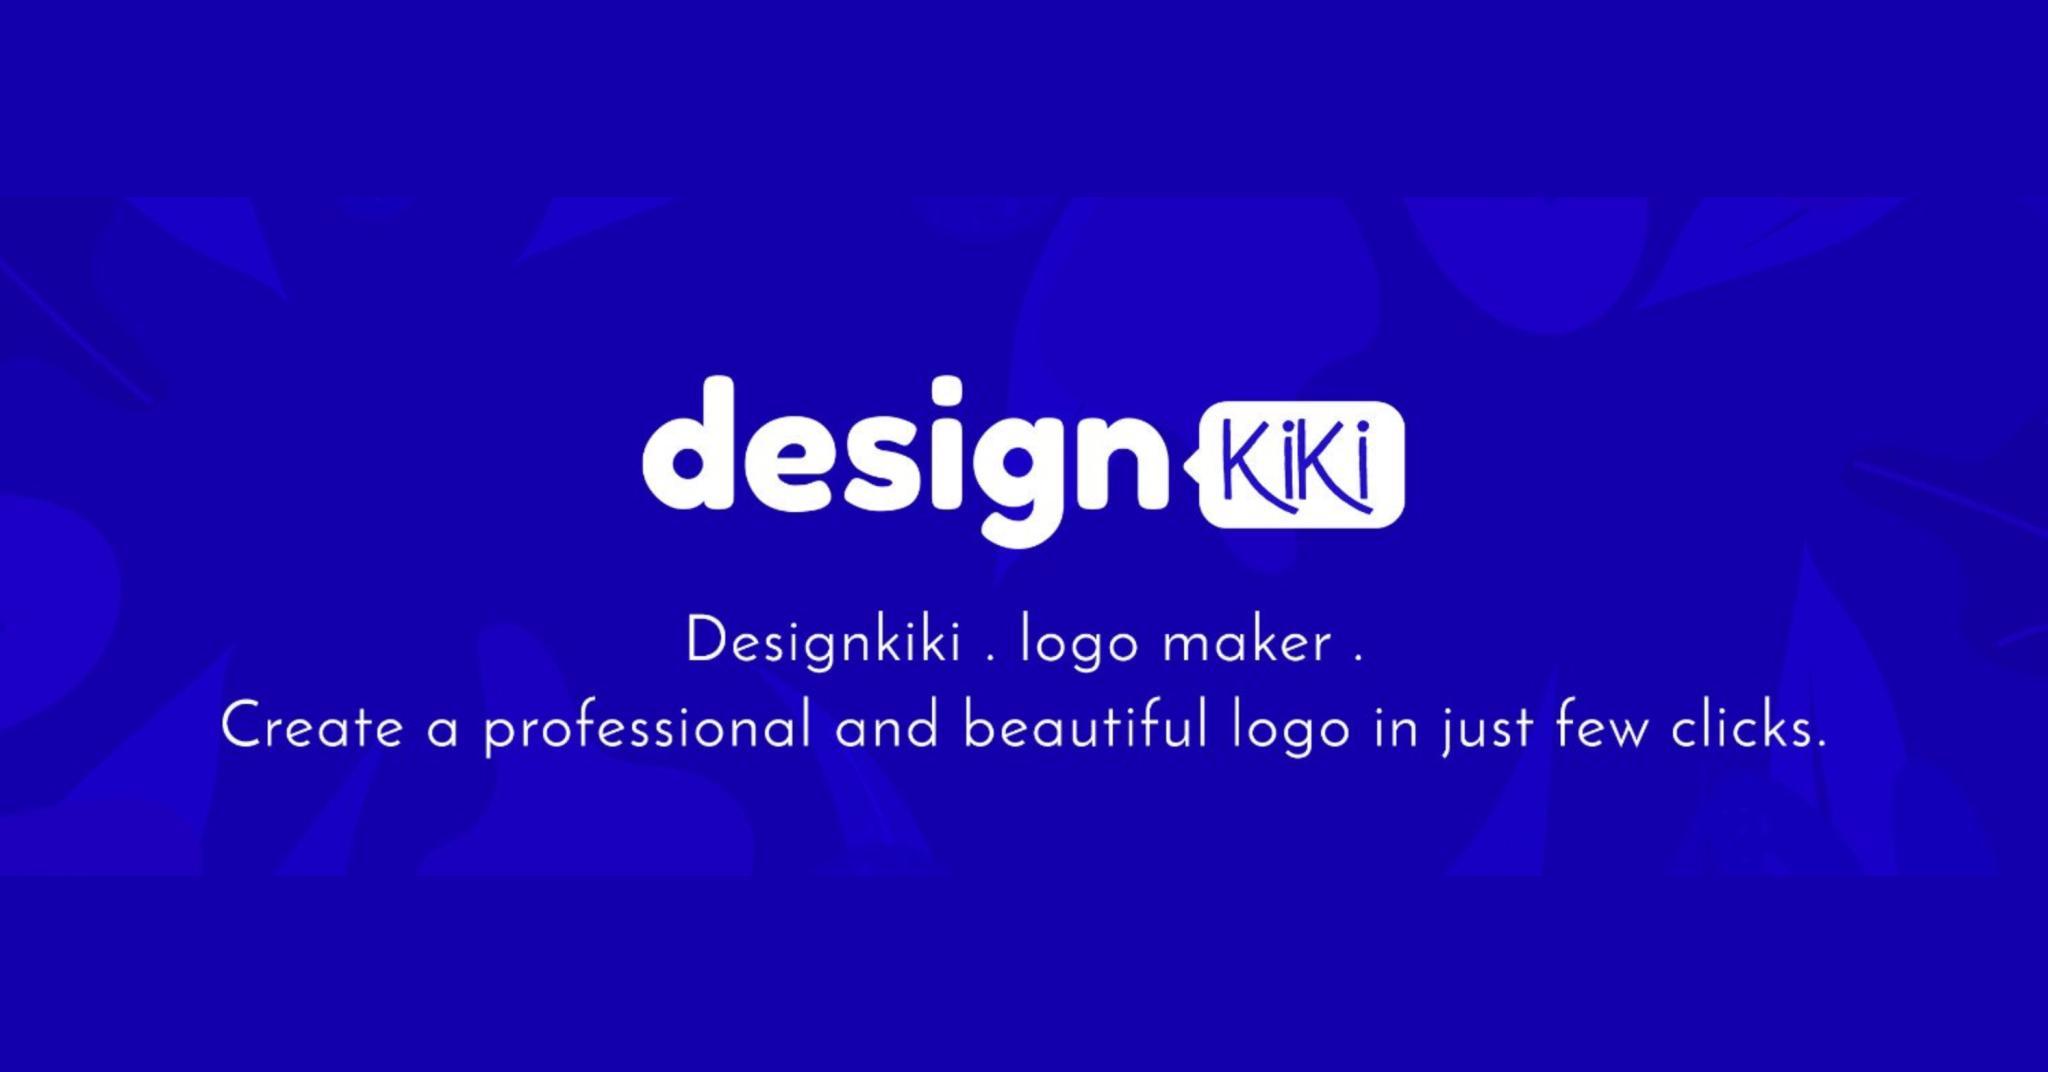 Designkiki